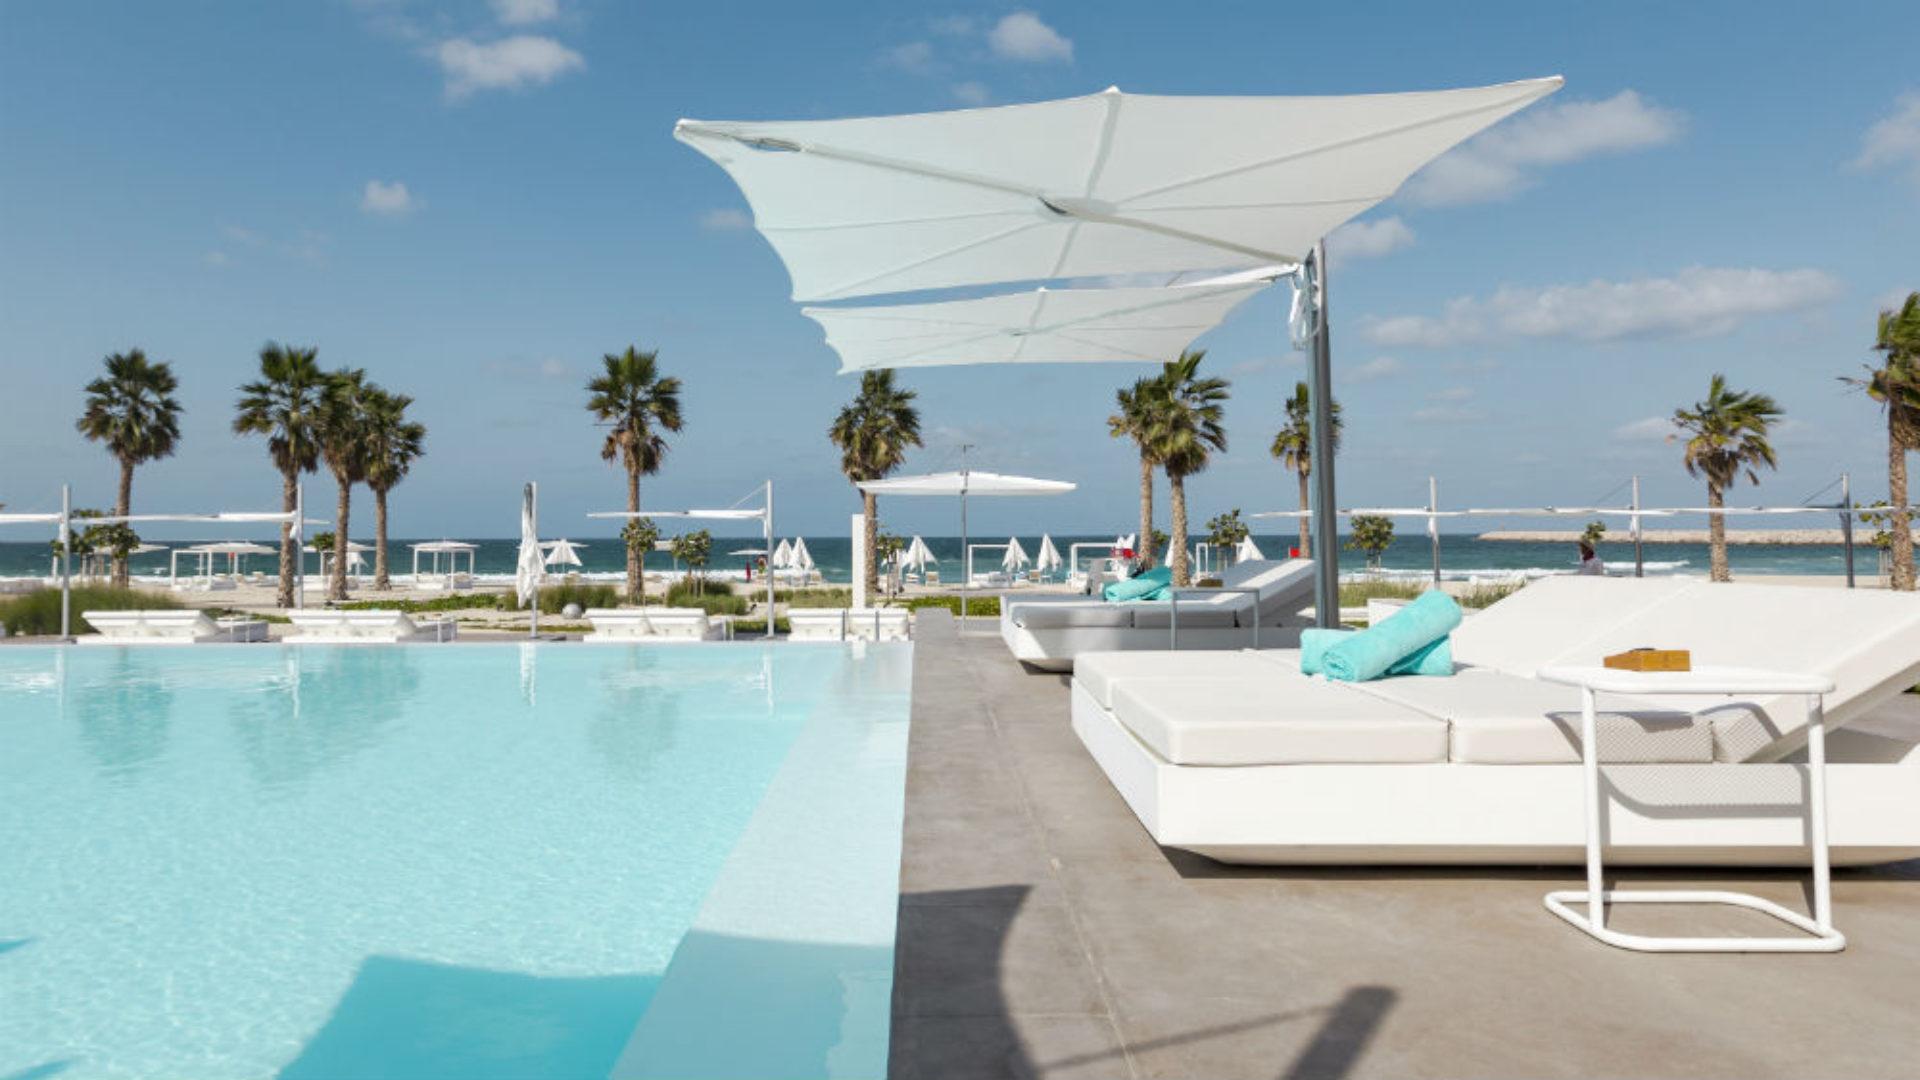 Main pool and sun loungers at Nikki Beach Resort & Spa